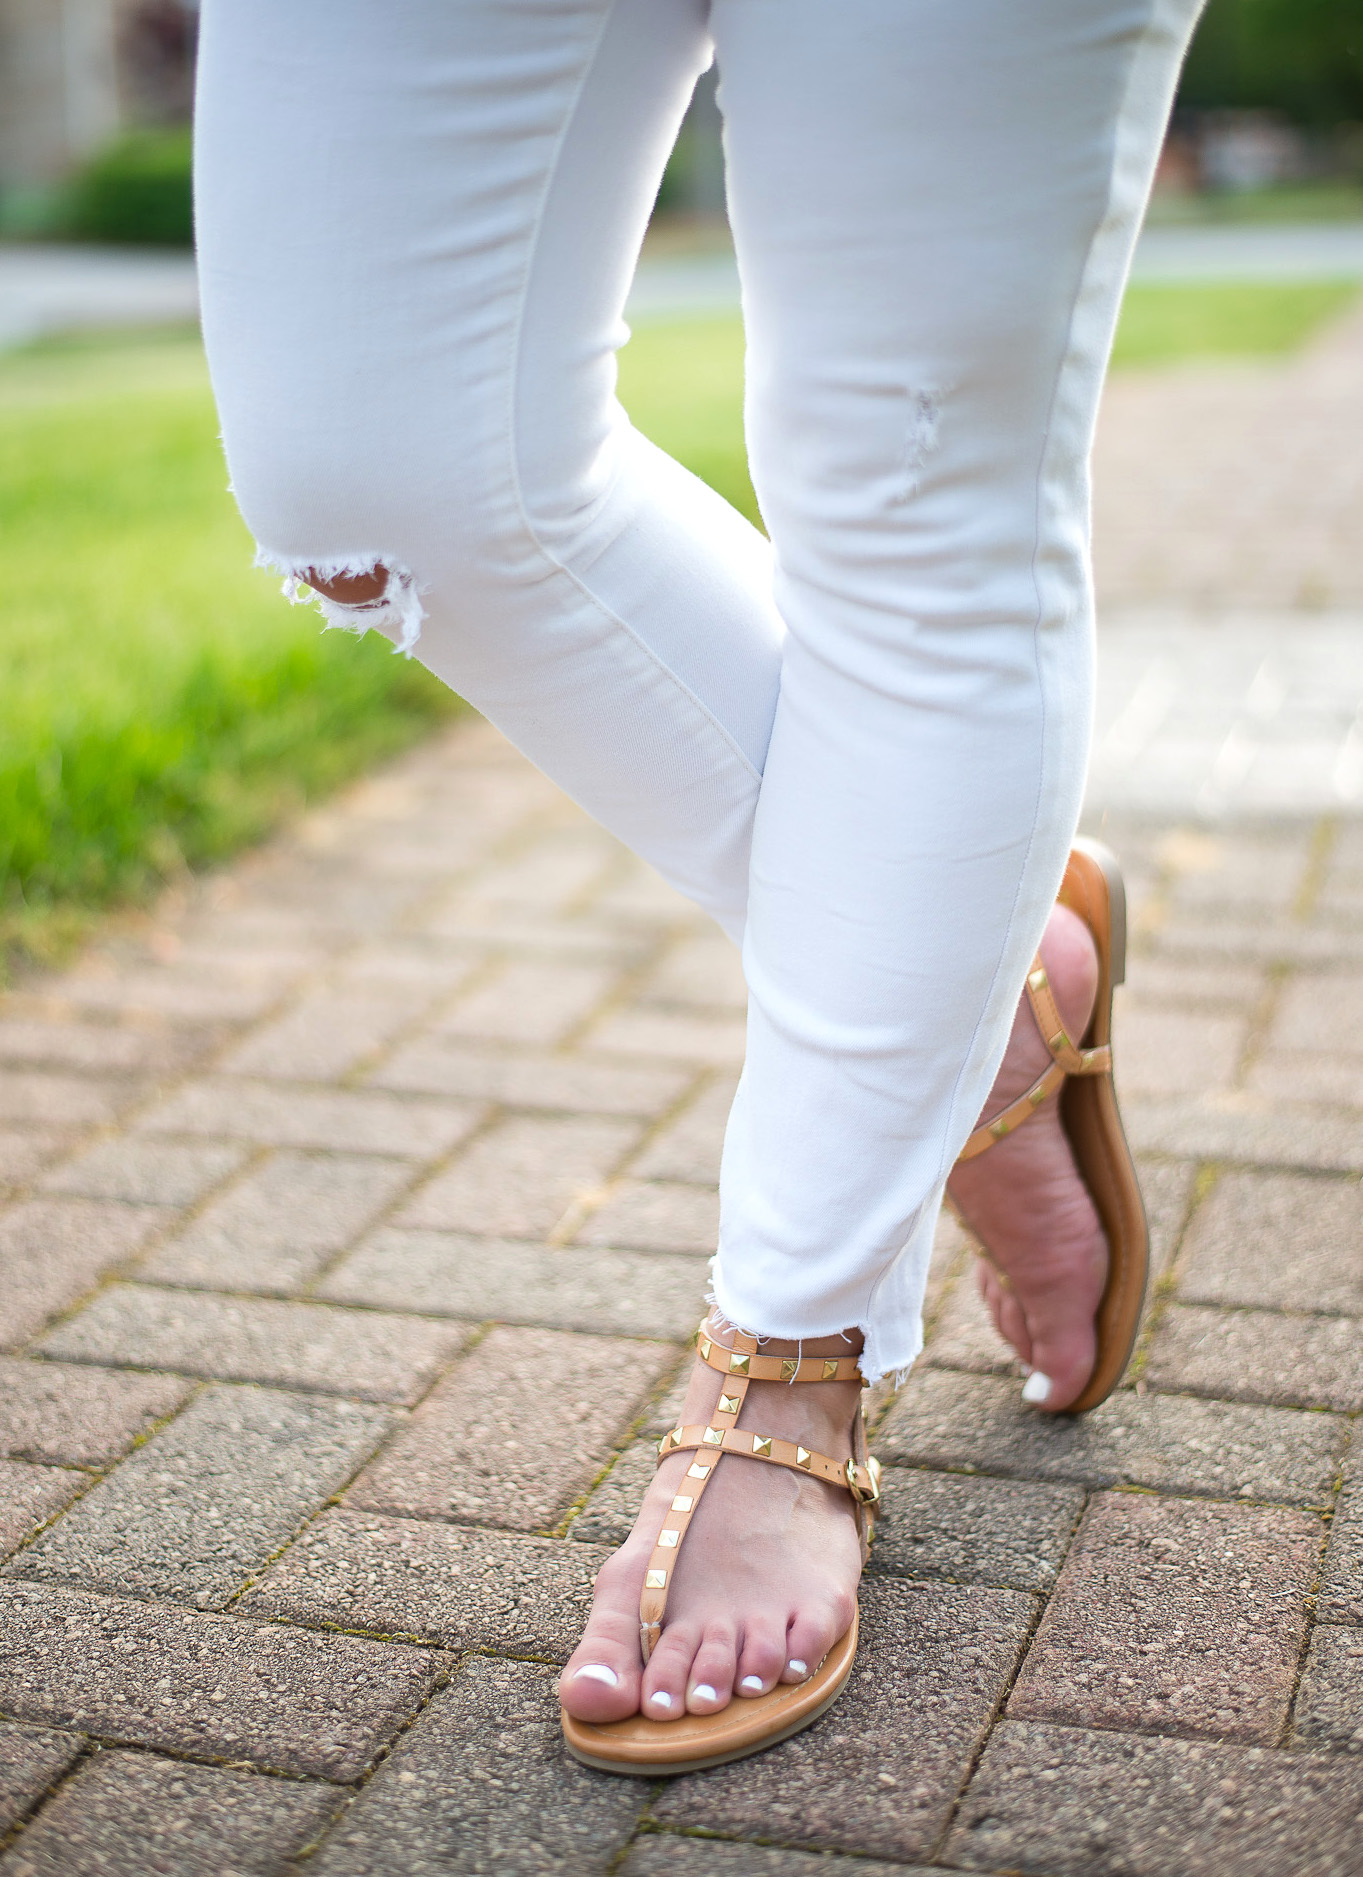 Rockstud gertie gladiator sandals in tan with frayed hem jeans